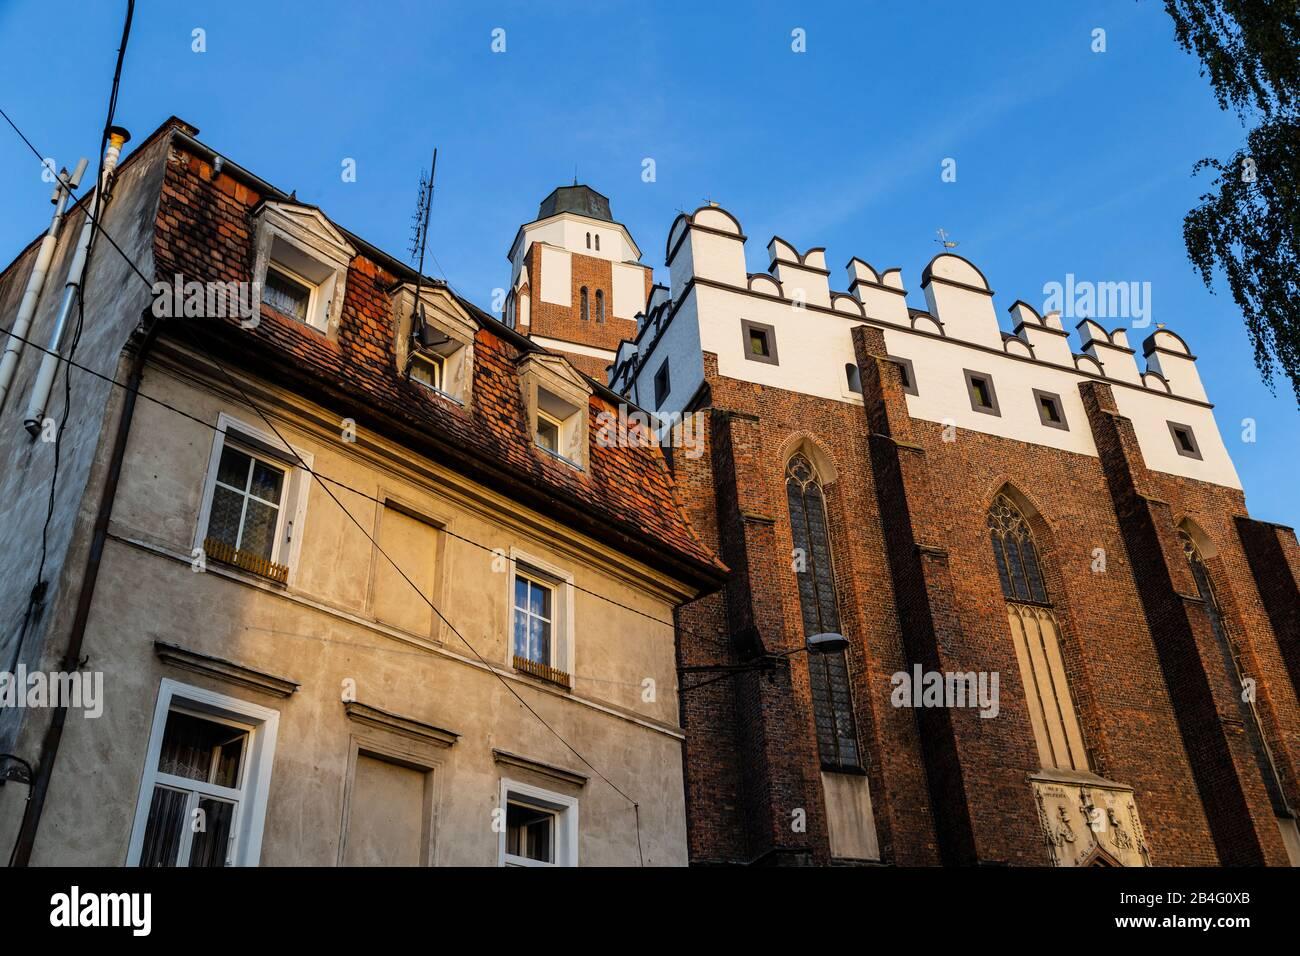 Europe, Poland, Nysa County, Opole Voivodeship, Paczkow / Patschkau, town hall and city center Stock Photo